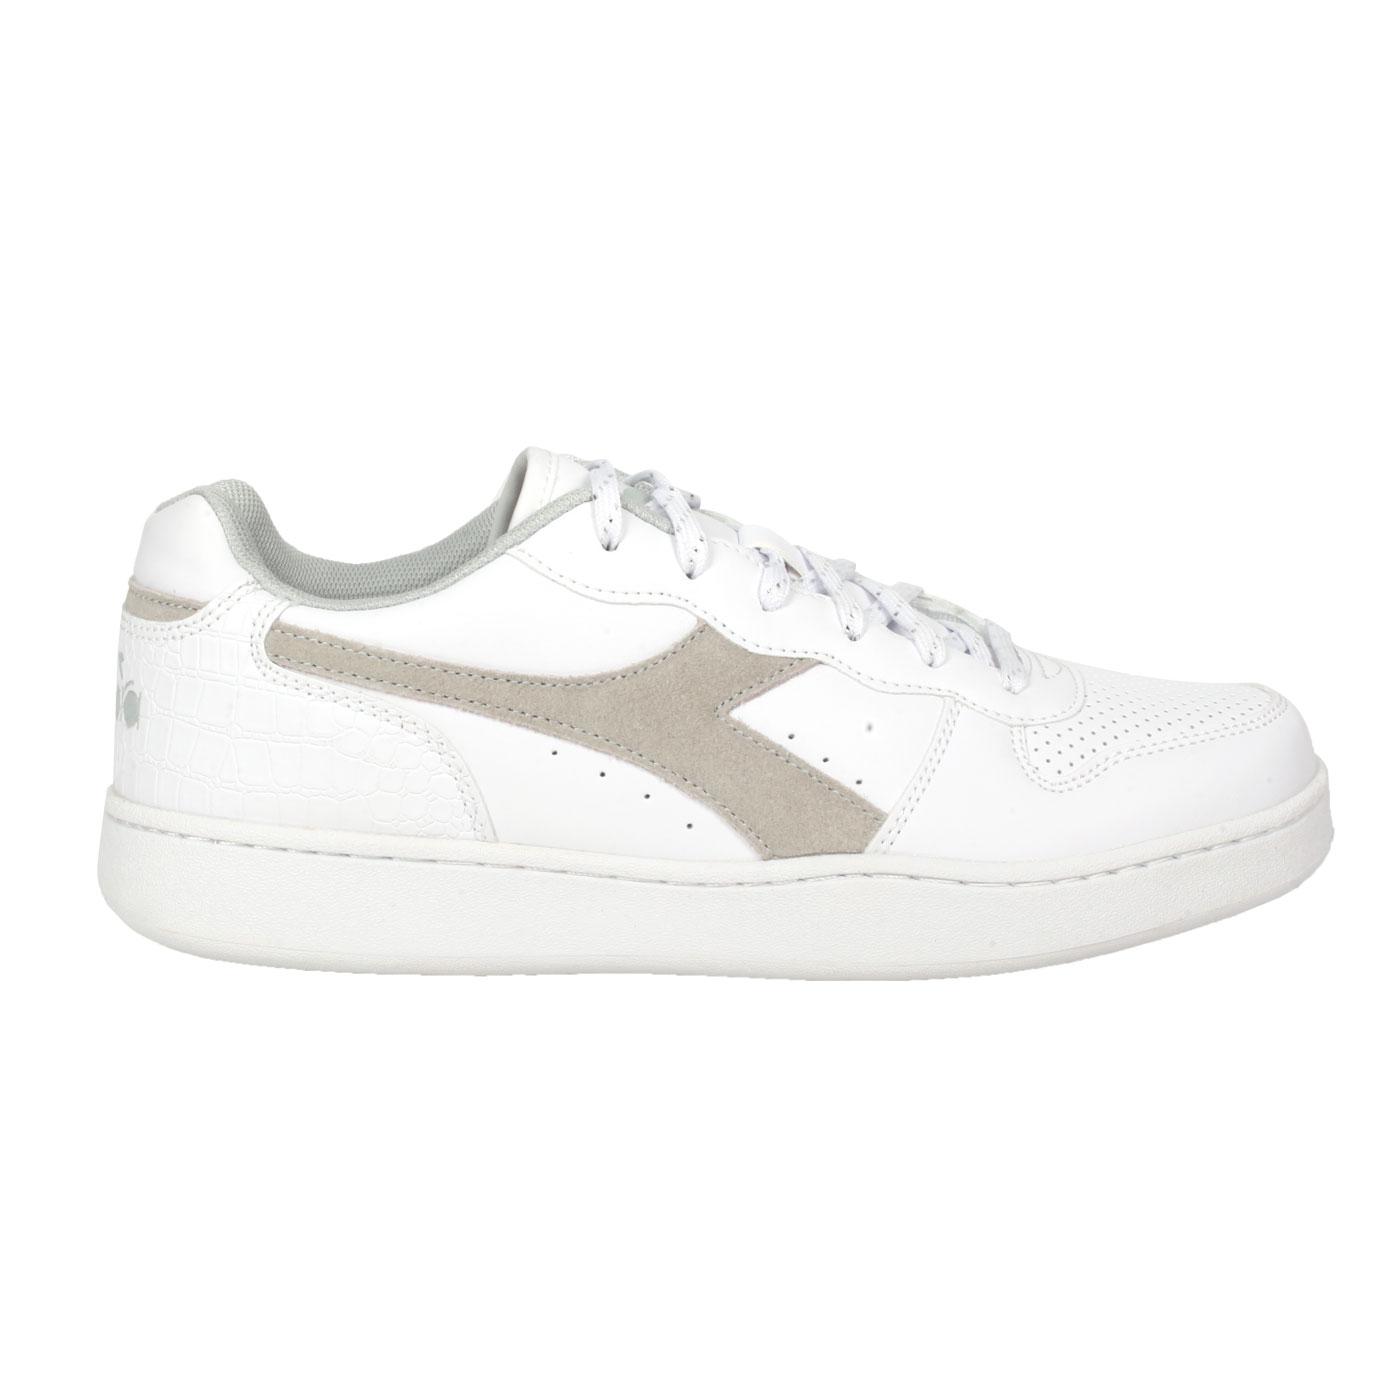 DIADORA 女款進口復古網球鞋 DA176999-C0341 - 白棕綠